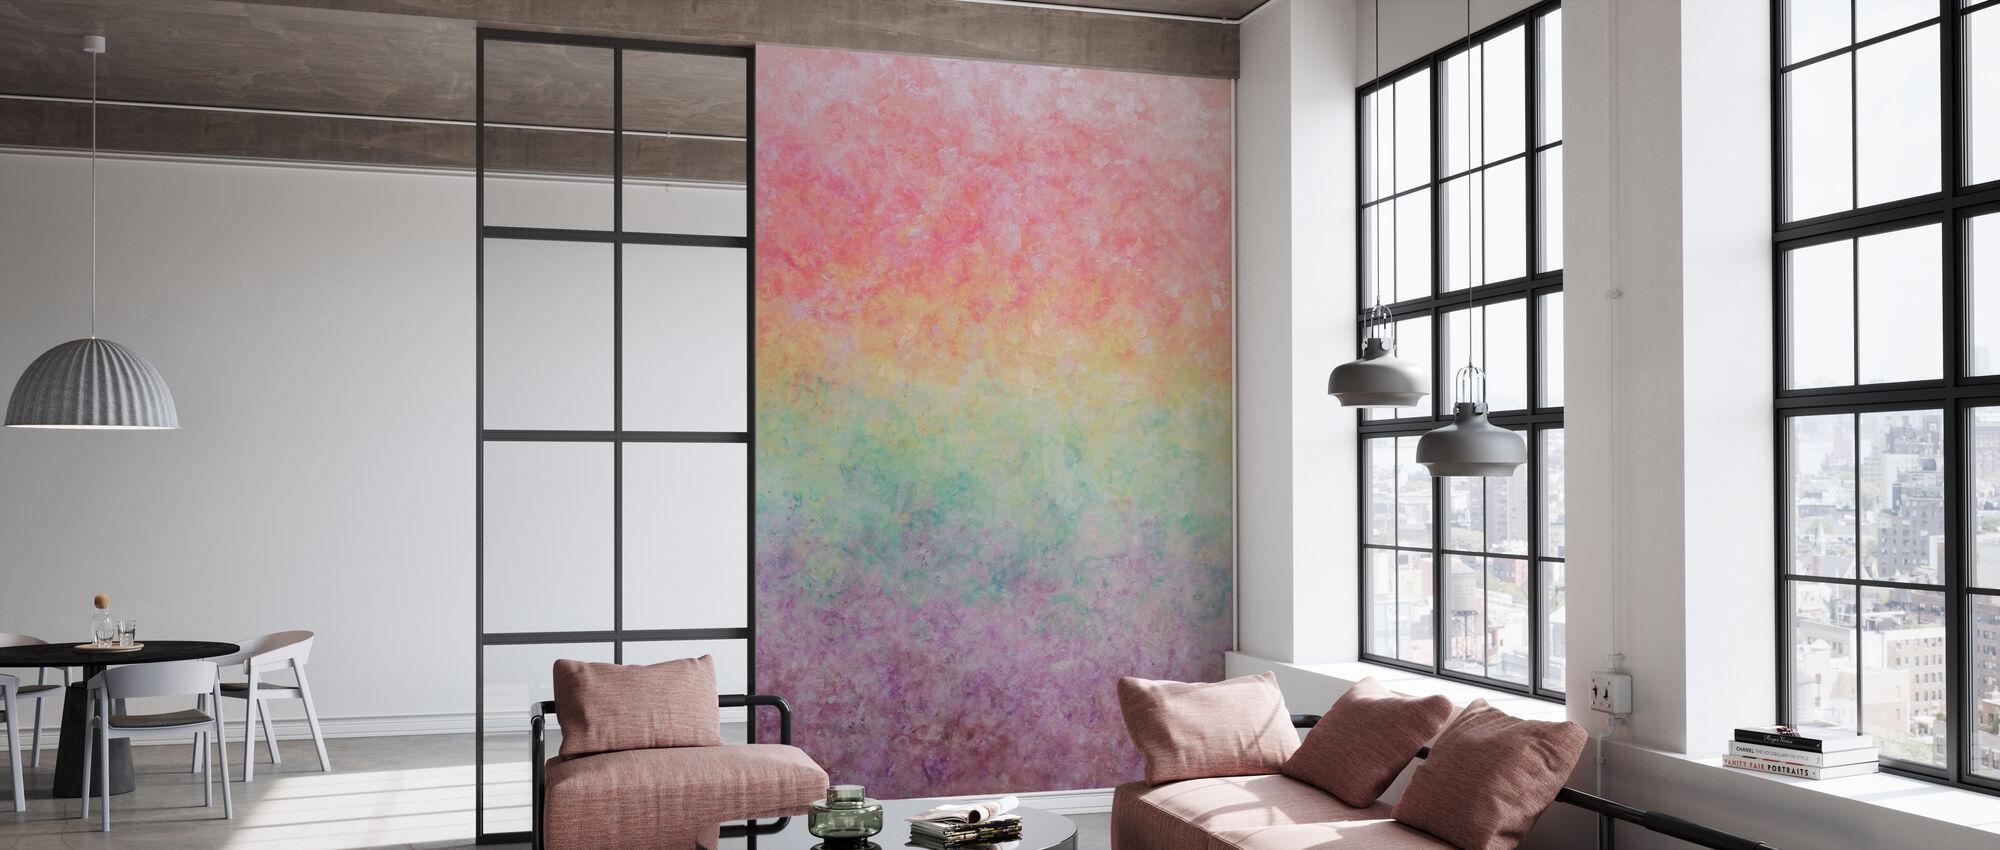 Chrysalis - Wallpaper - Office